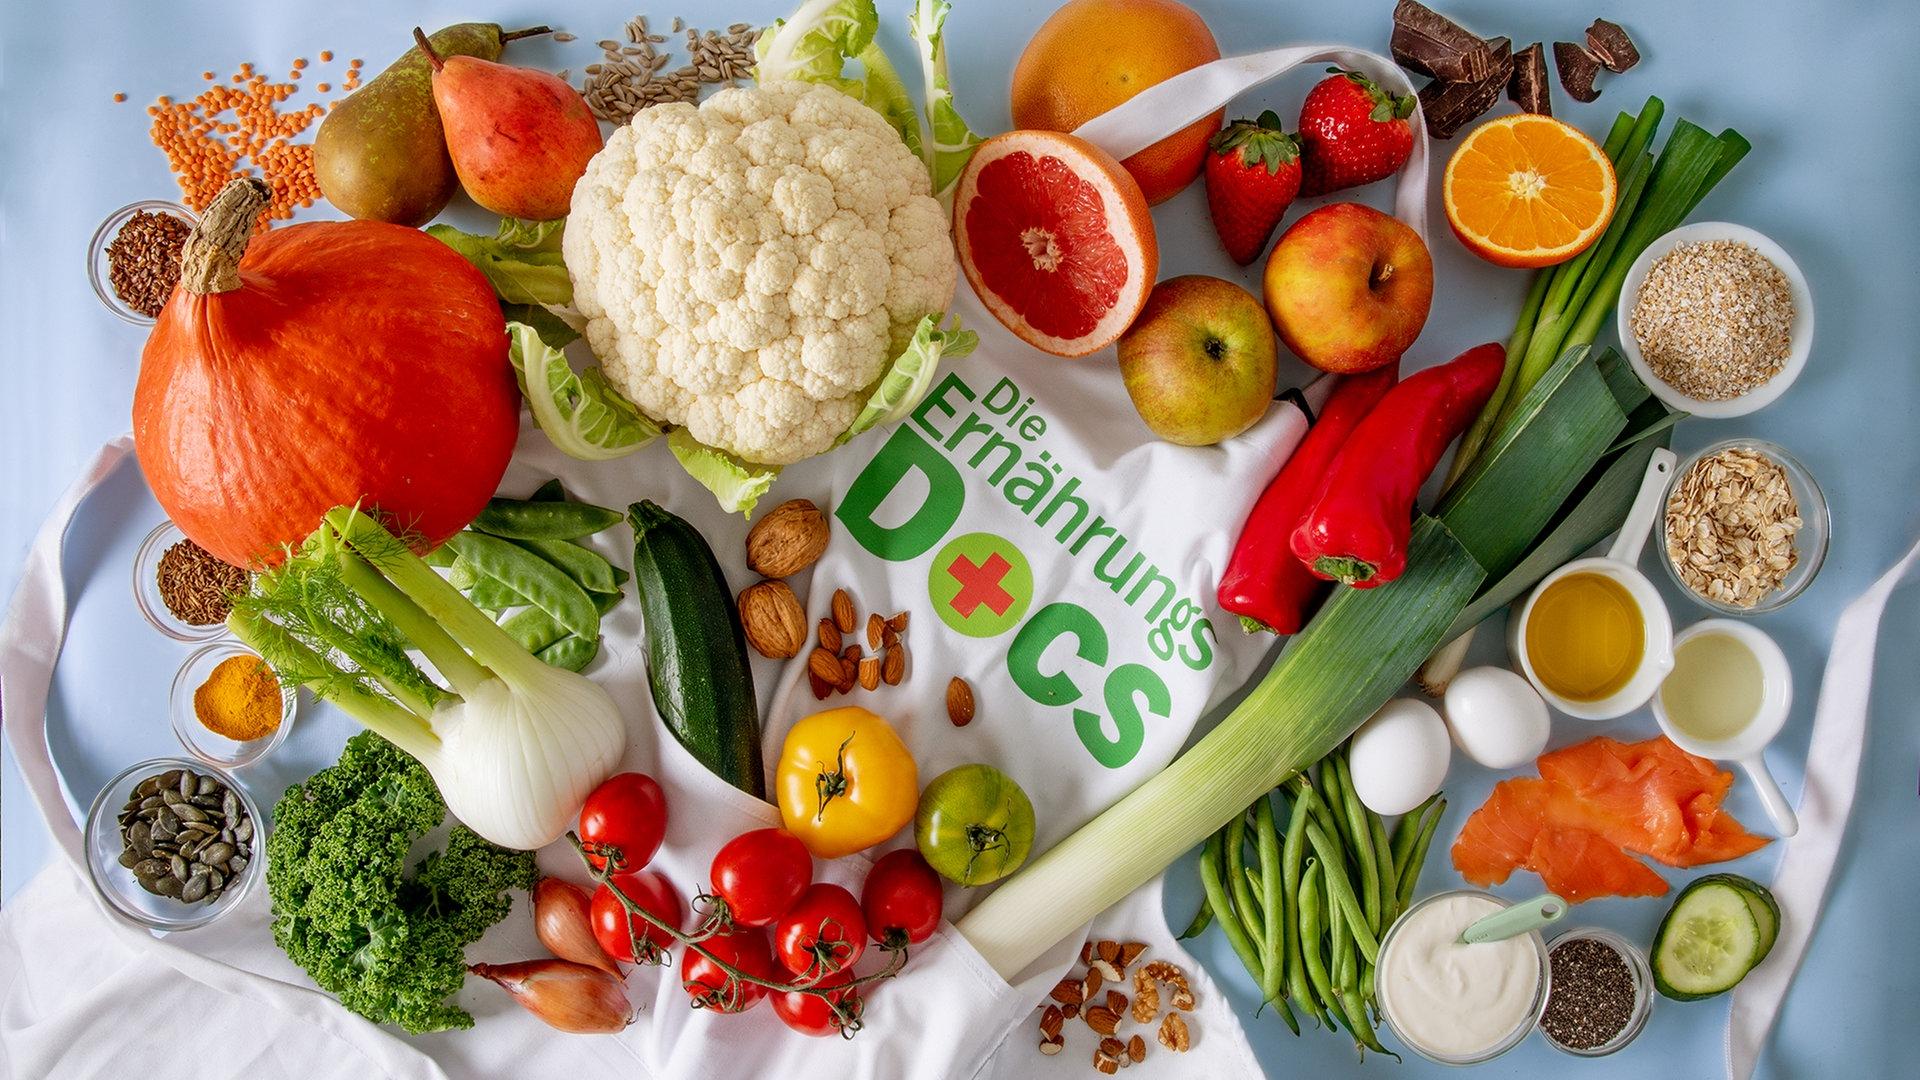 Ernährung bei Arthrose: wenig Fleisch, viel Grünes  NDR.de